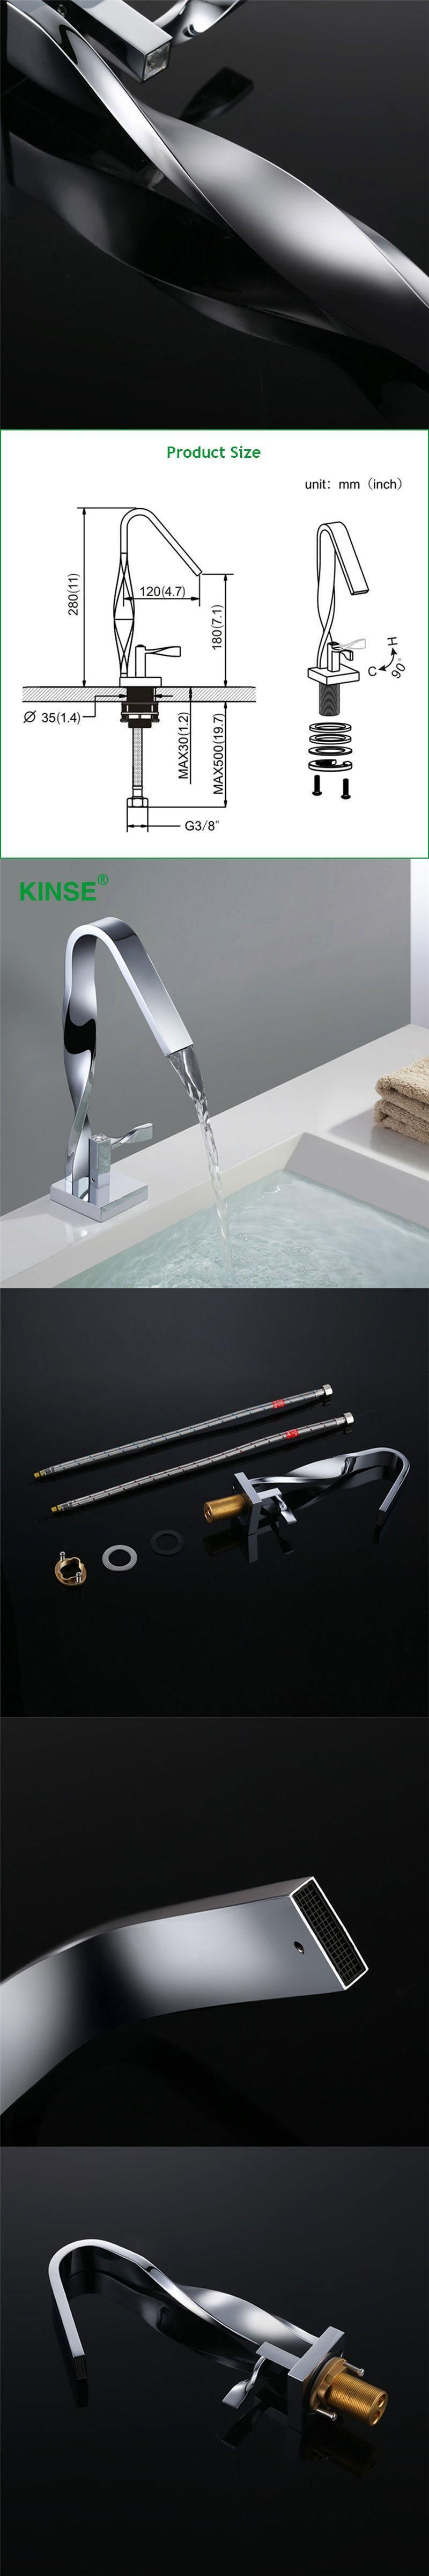 KINSE Art Style Brass Material Chrome Finish Contemporary Bathroom ...